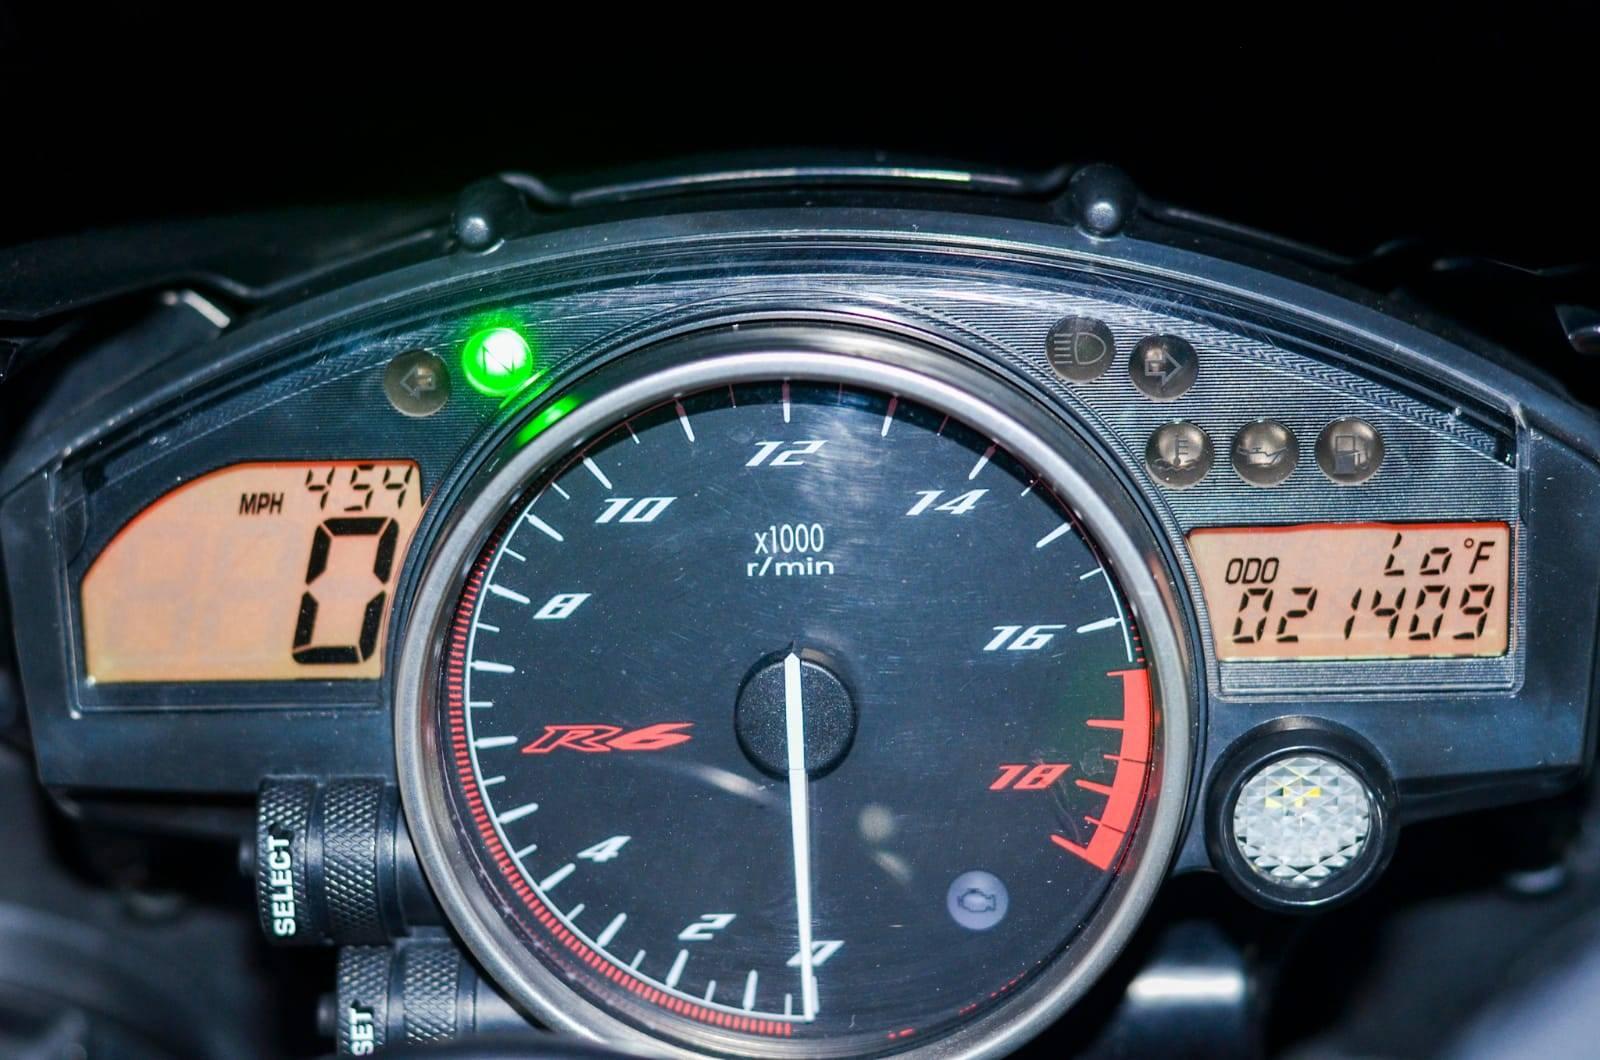 2009 Yamaha YZF-R6 8